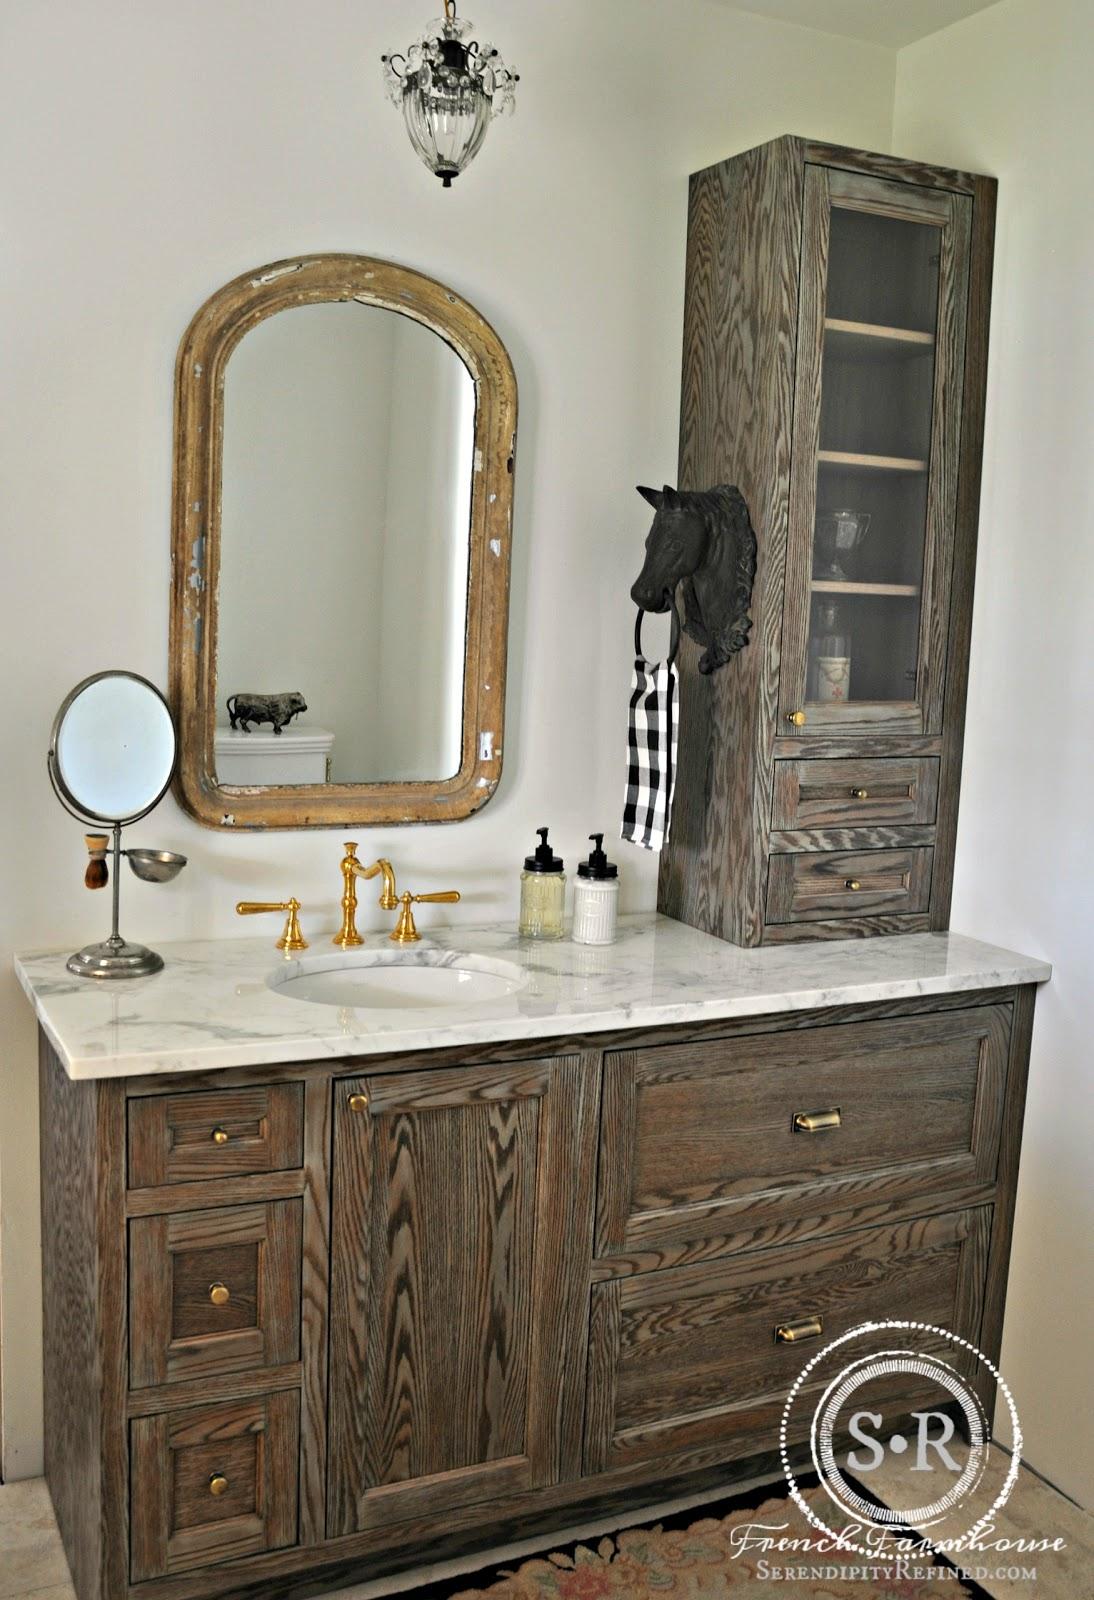 Serendipity Refined Blog: Rustic European Farmhouse Style ... on Rustic Farmhouse Bathroom  id=49021